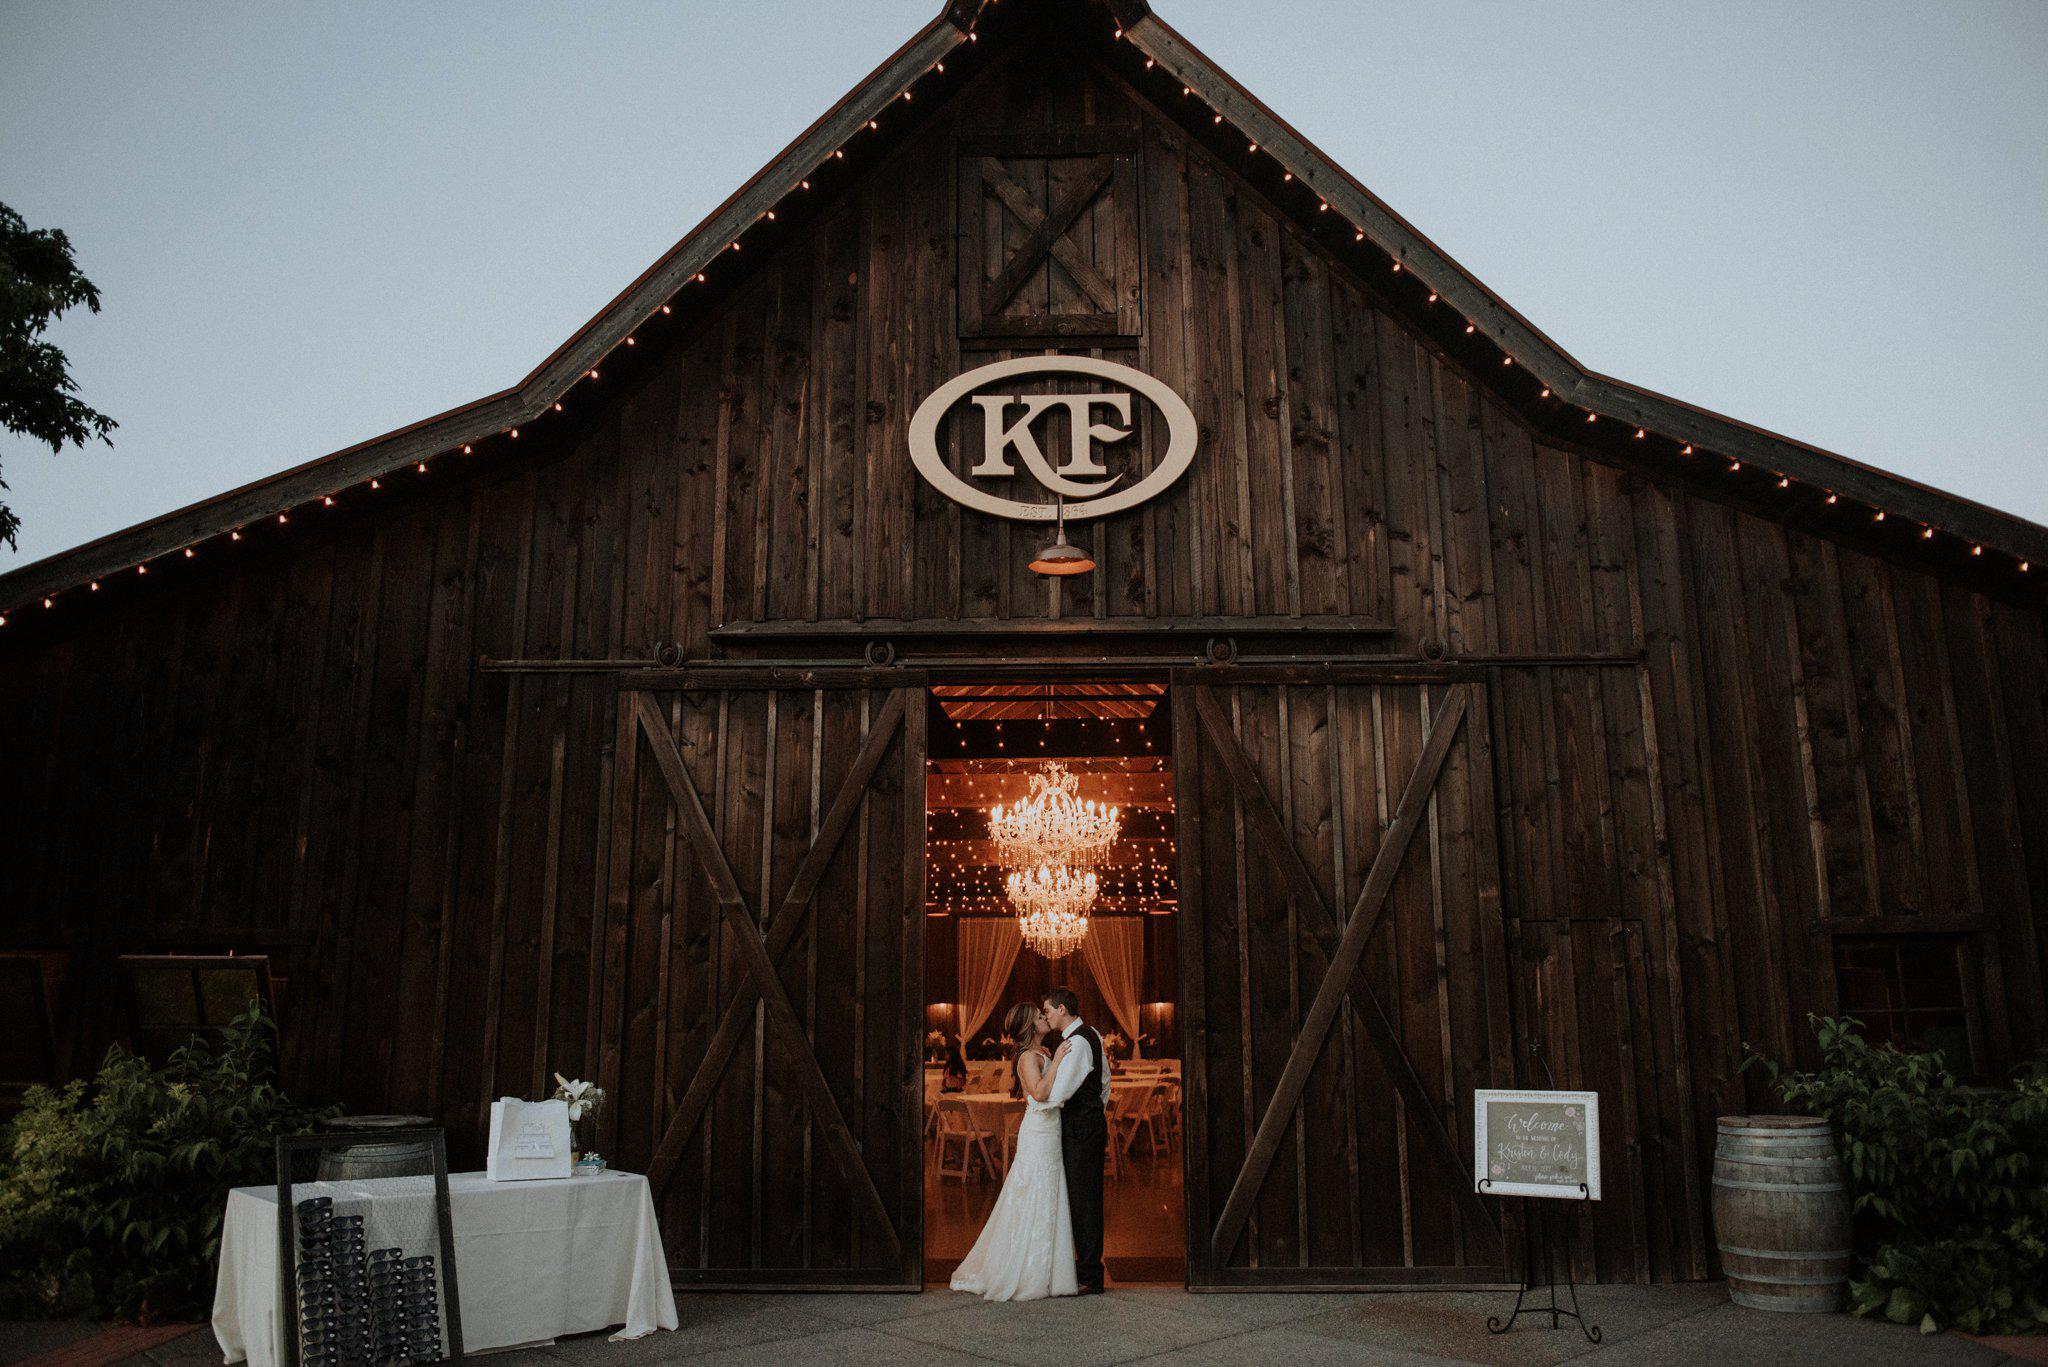 kristen-and-cody-the-kelley-farm-wedding-seattle-photographer-caitlyn-nikula-100.jpg